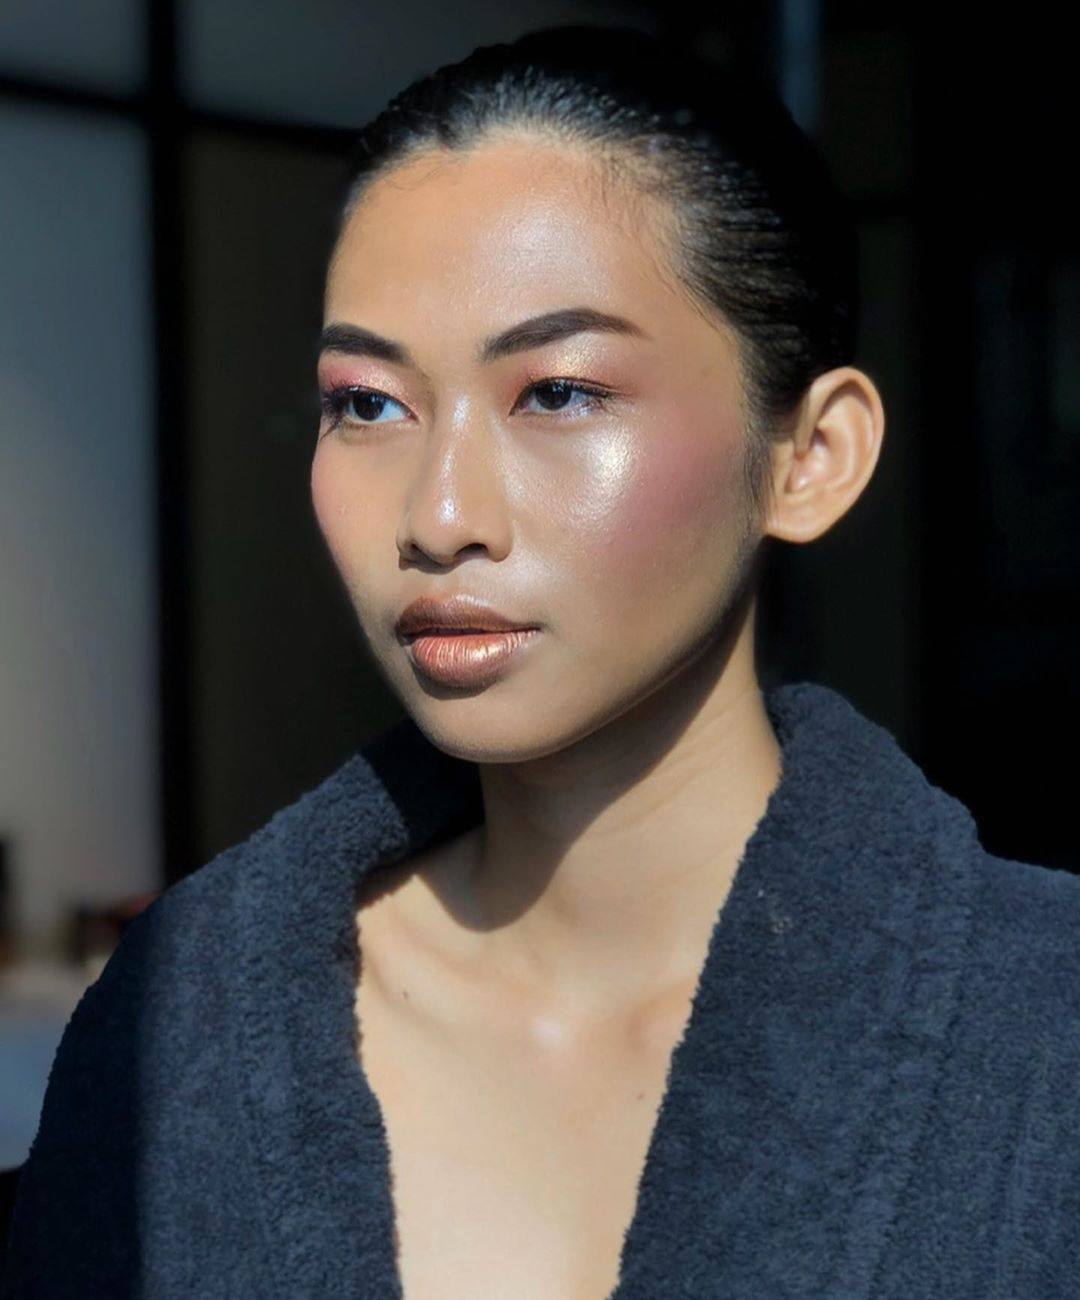 Nars Uzo Makeup Looks